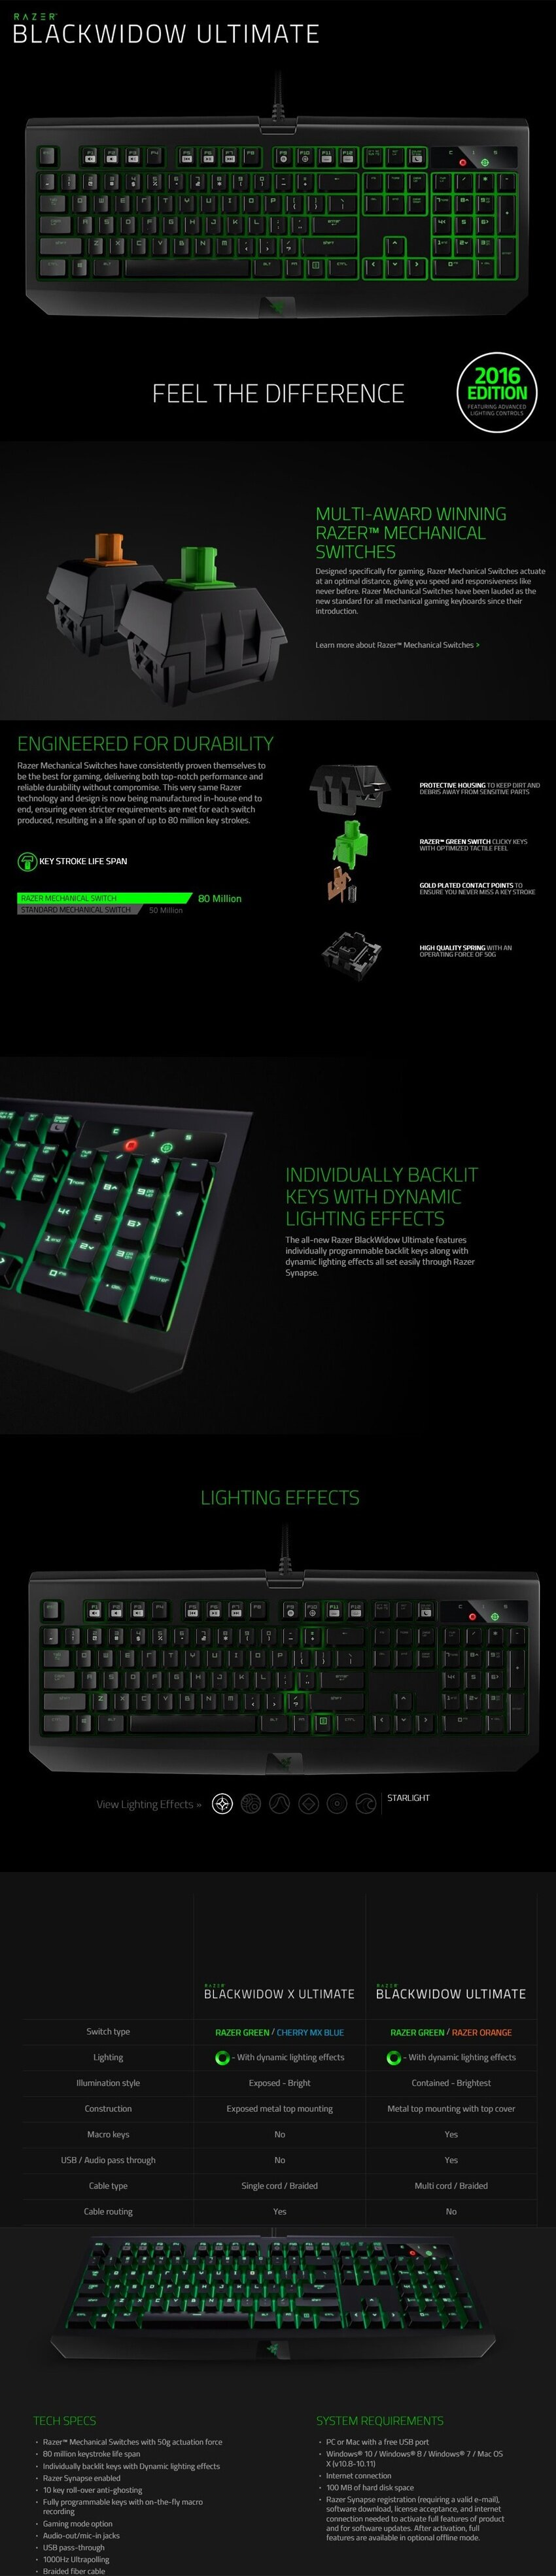 Razer Blackwidow Ultimate 2016 Mechanical Keyboard RZ03-01700100-R3M1